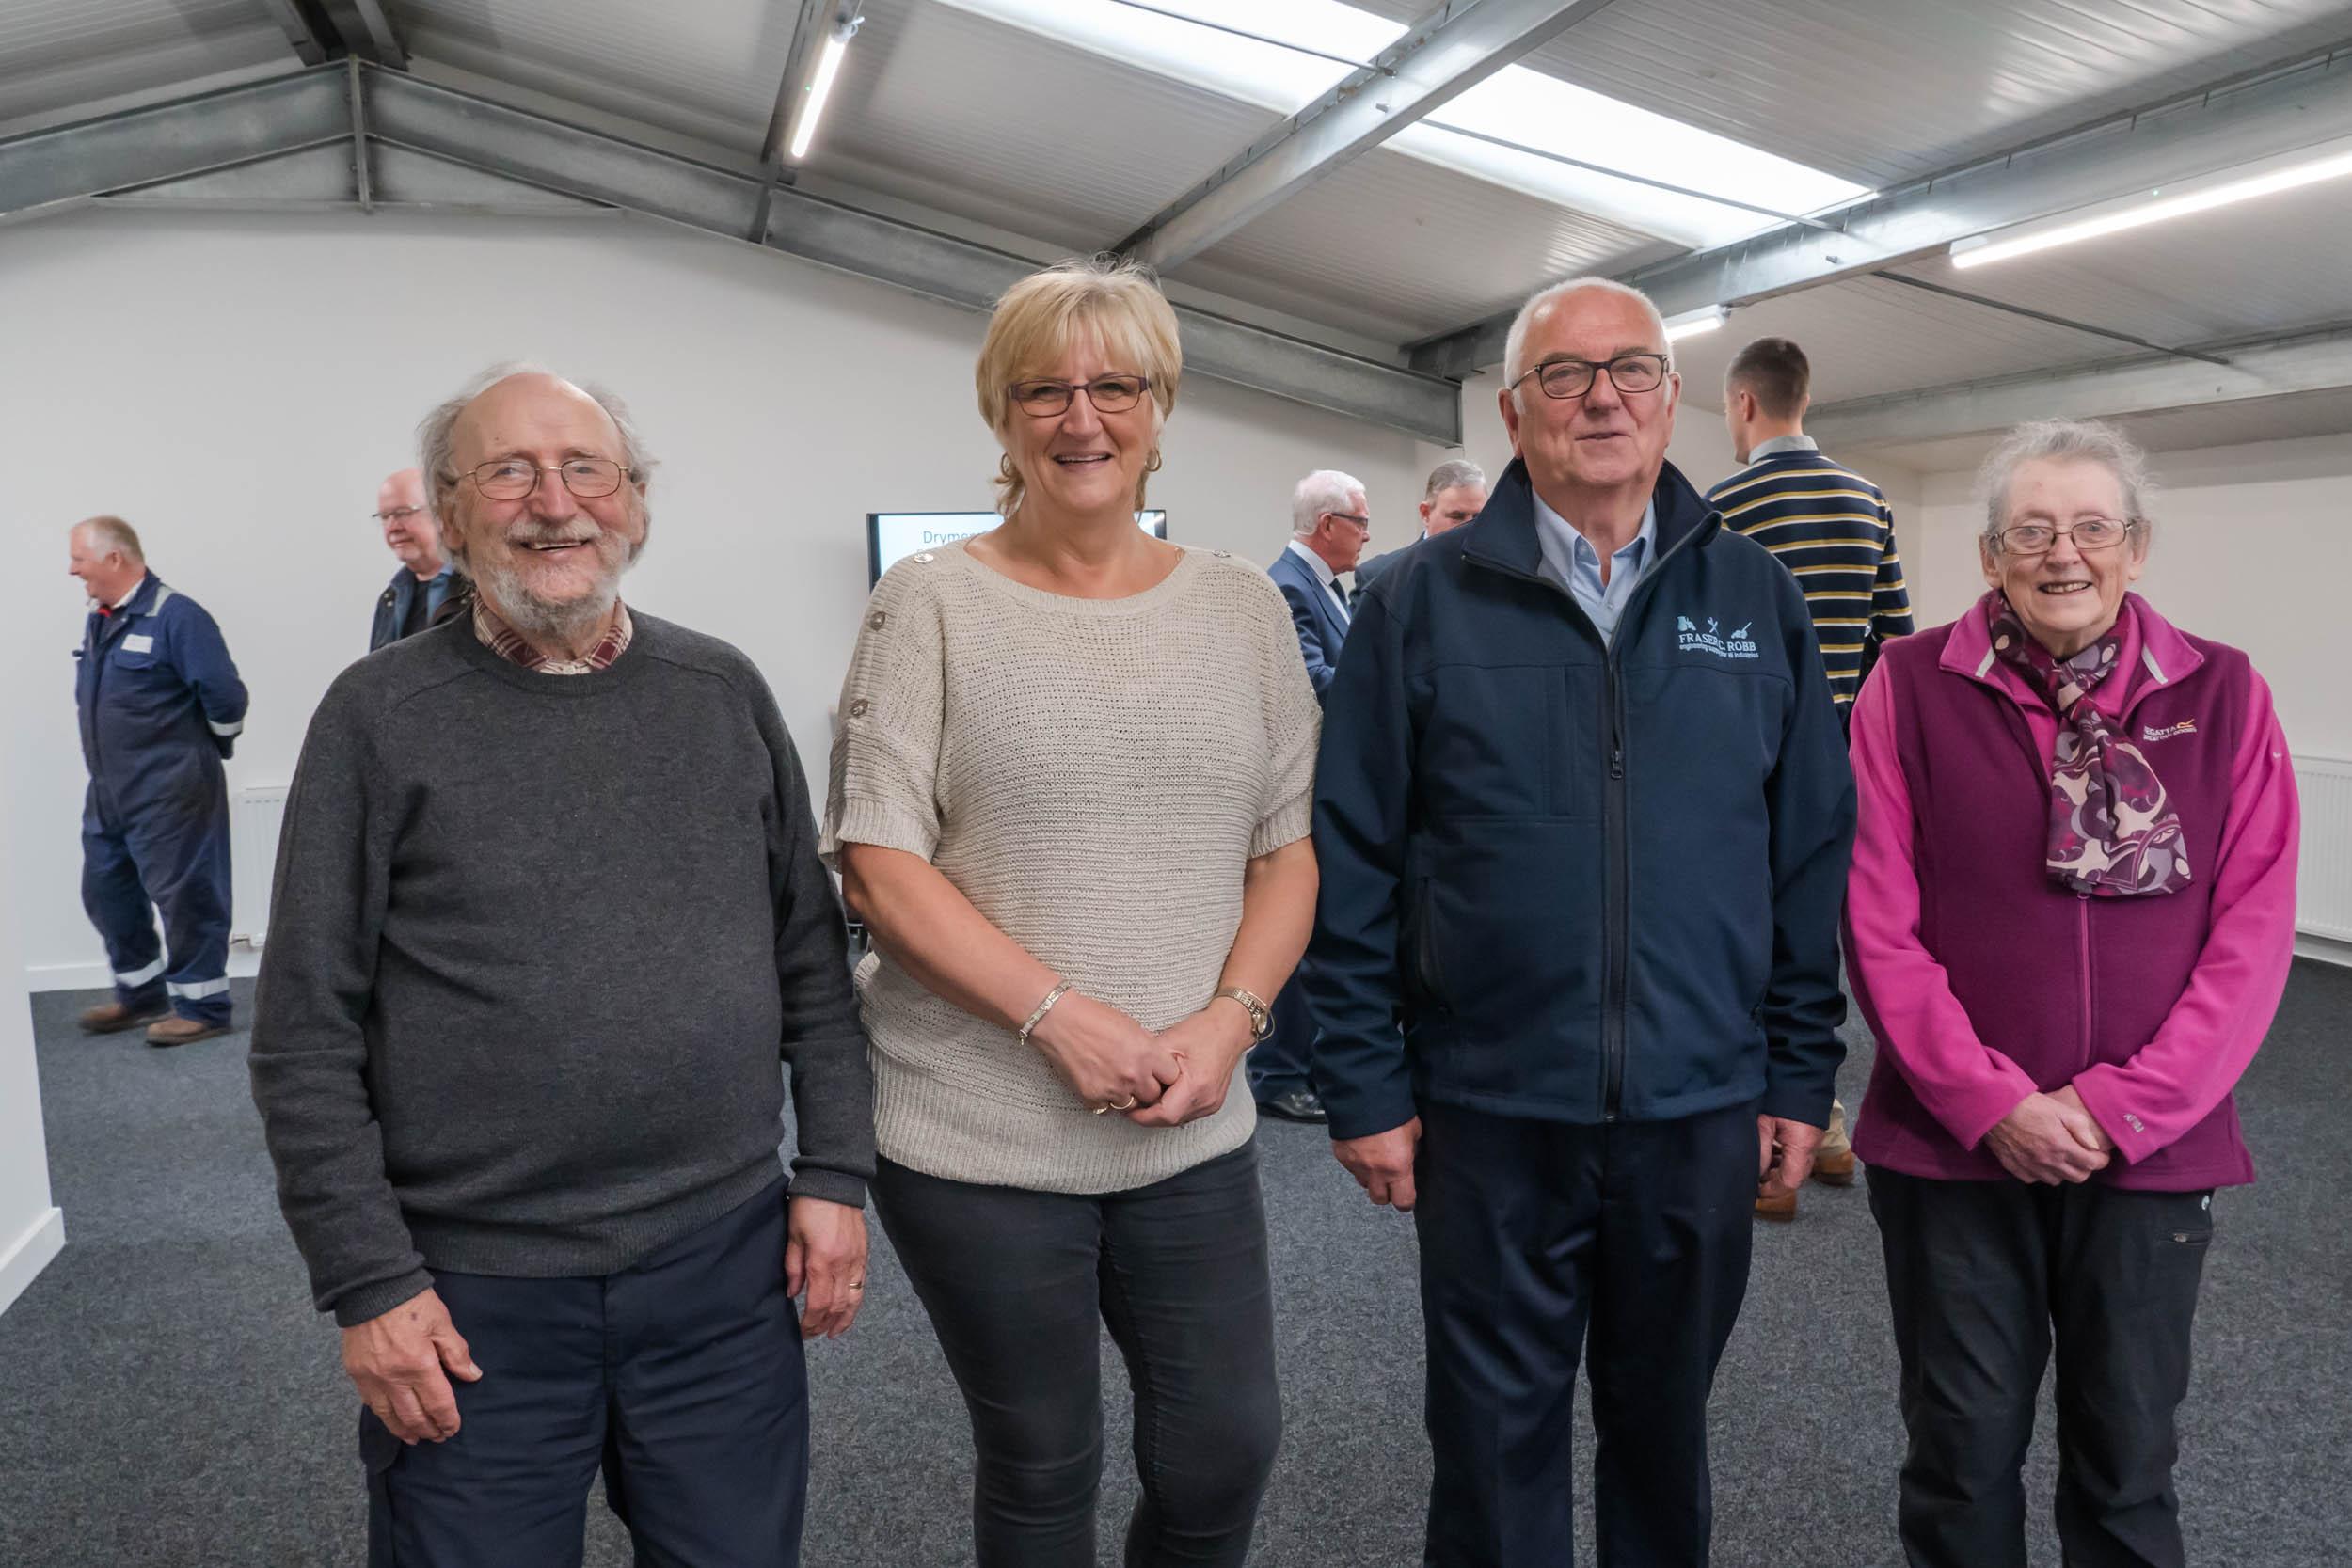 Members of Drymen Community Council